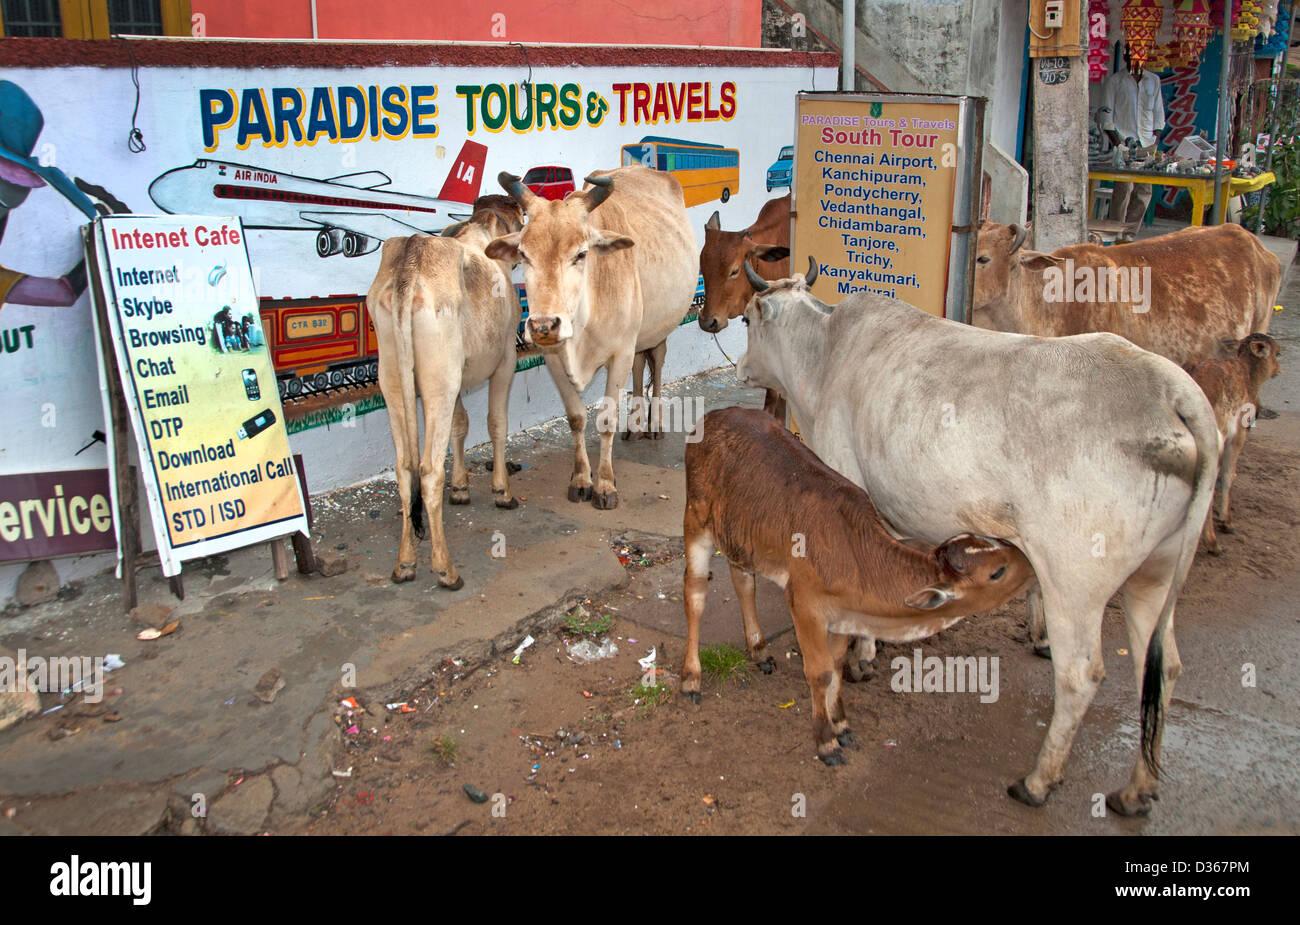 Vacche sacre agenzia di viaggio Viaggi Paradise Tours Covelong ( Kovalam o Cobelon ) India Tamil Nadu Immagini Stock